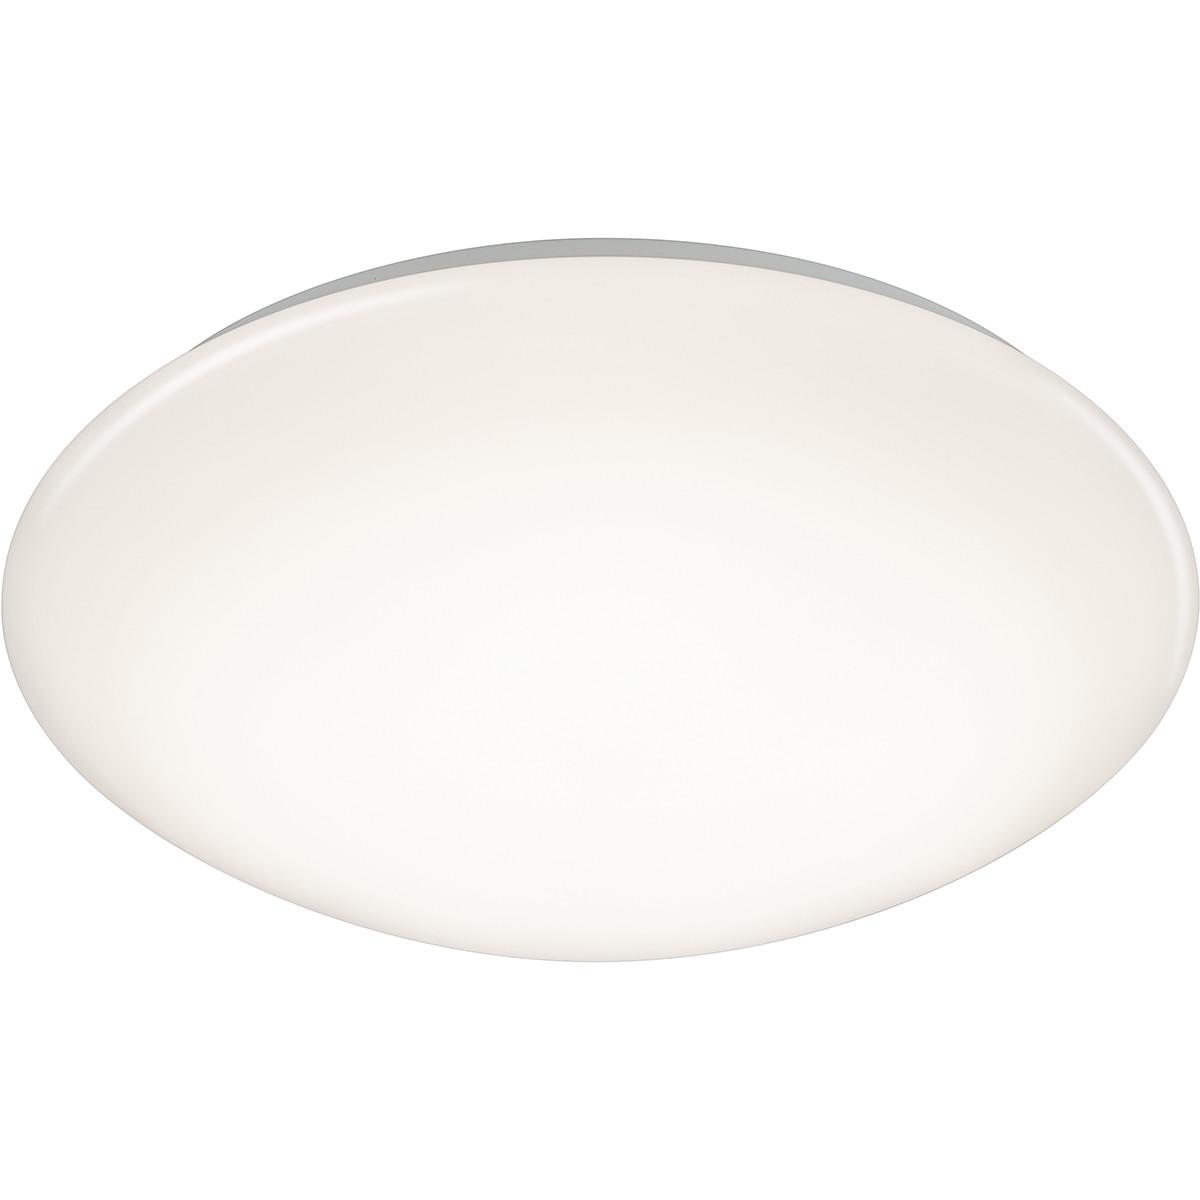 LED Plafondlamp met Bewegingssensor - Trion Poly - Opbouw Rond 18W - Spatwaterdicht IP44 - Warm Wit